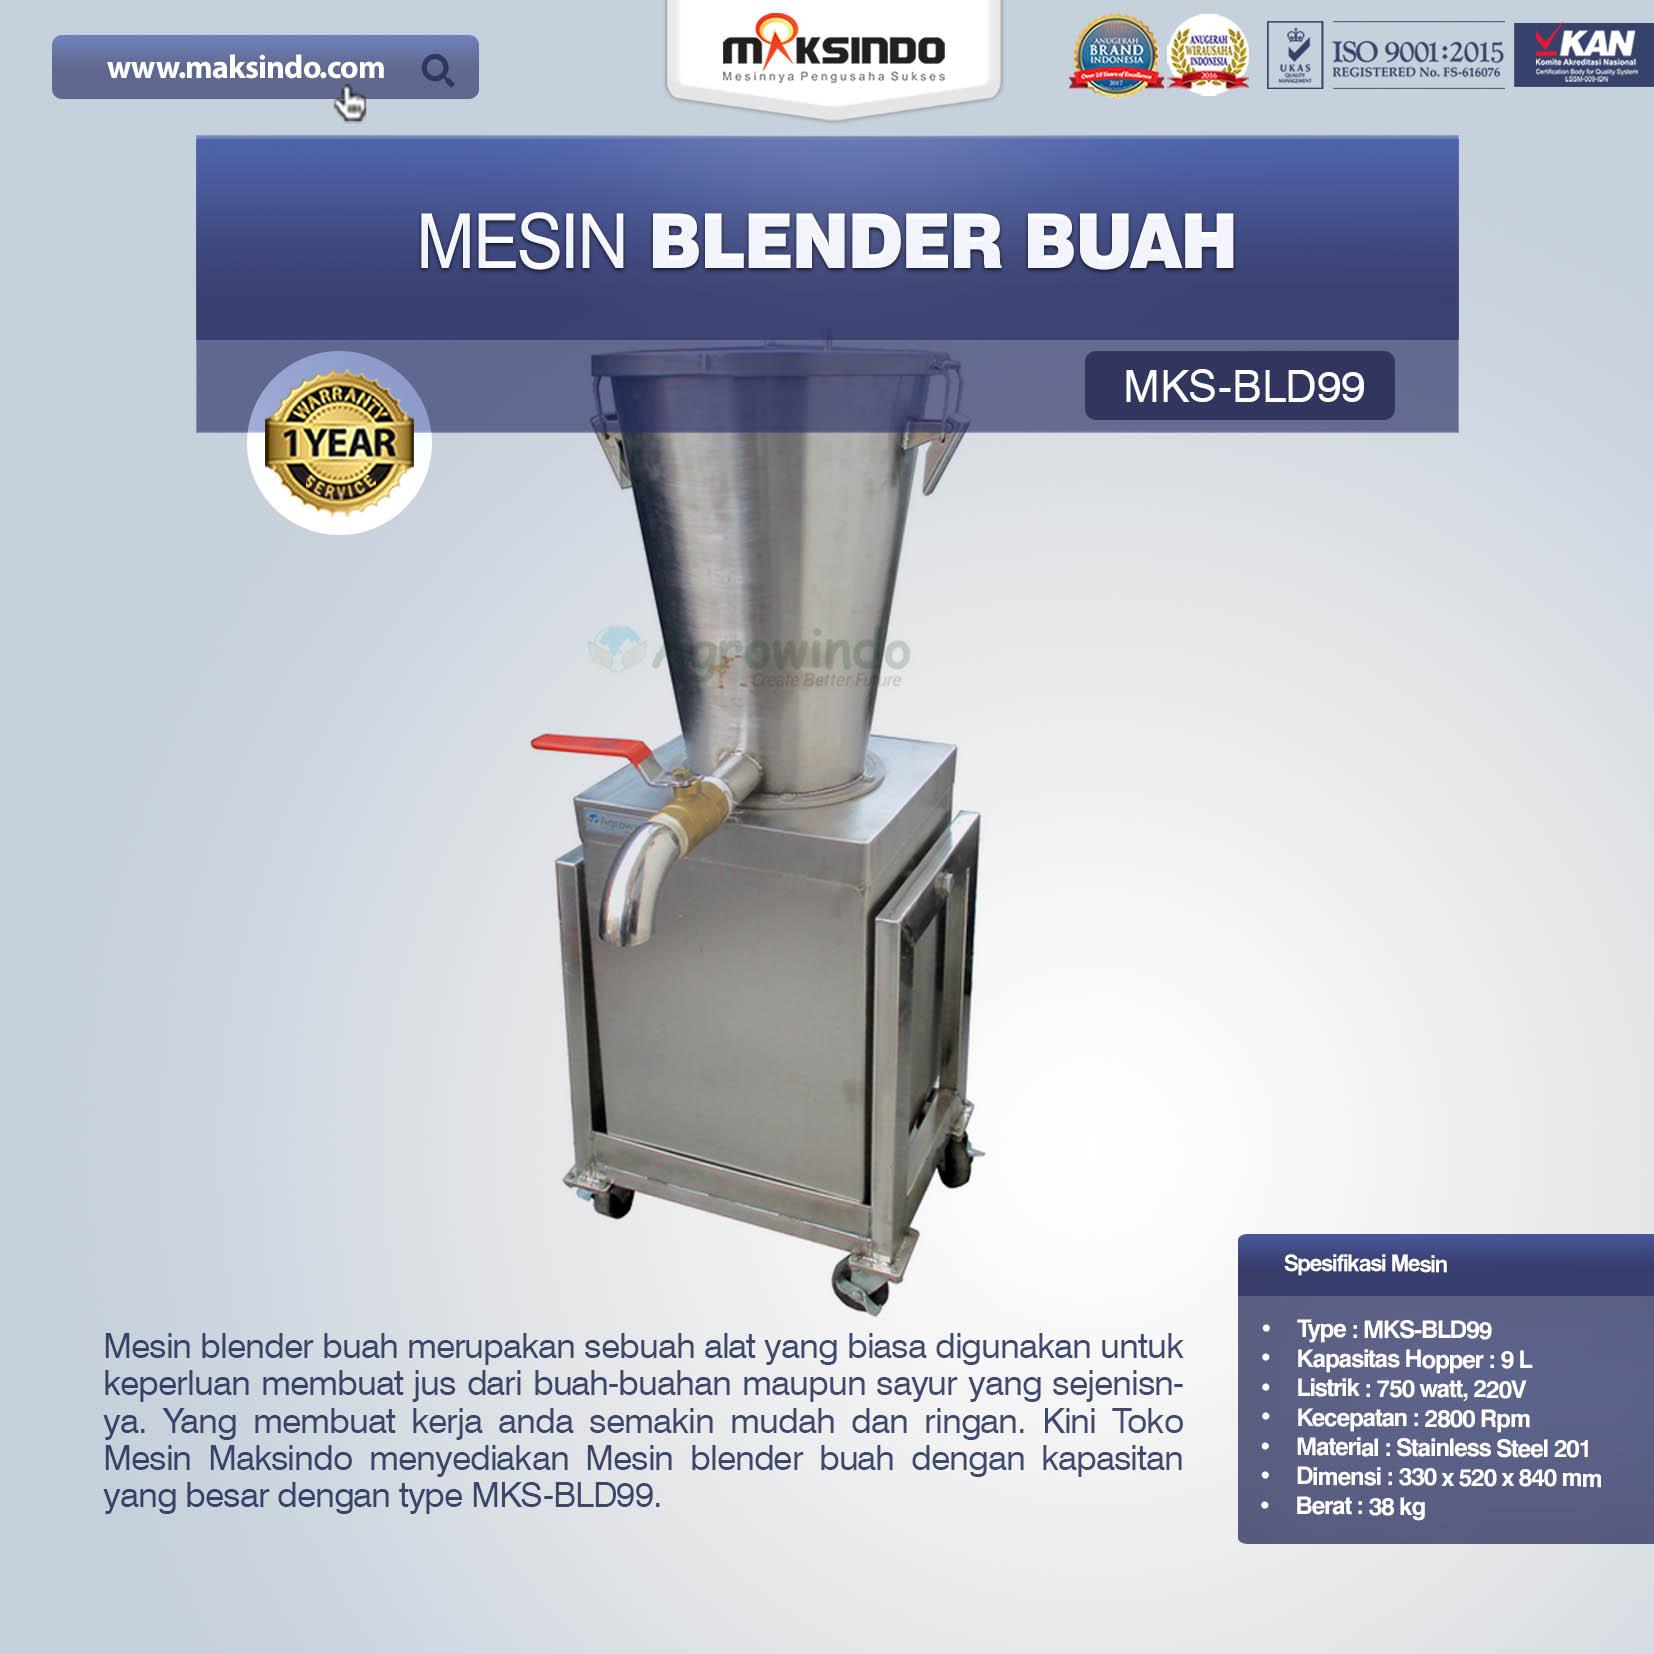 Jual Mesin Blender Buah MKS-BLD99 di Bandung